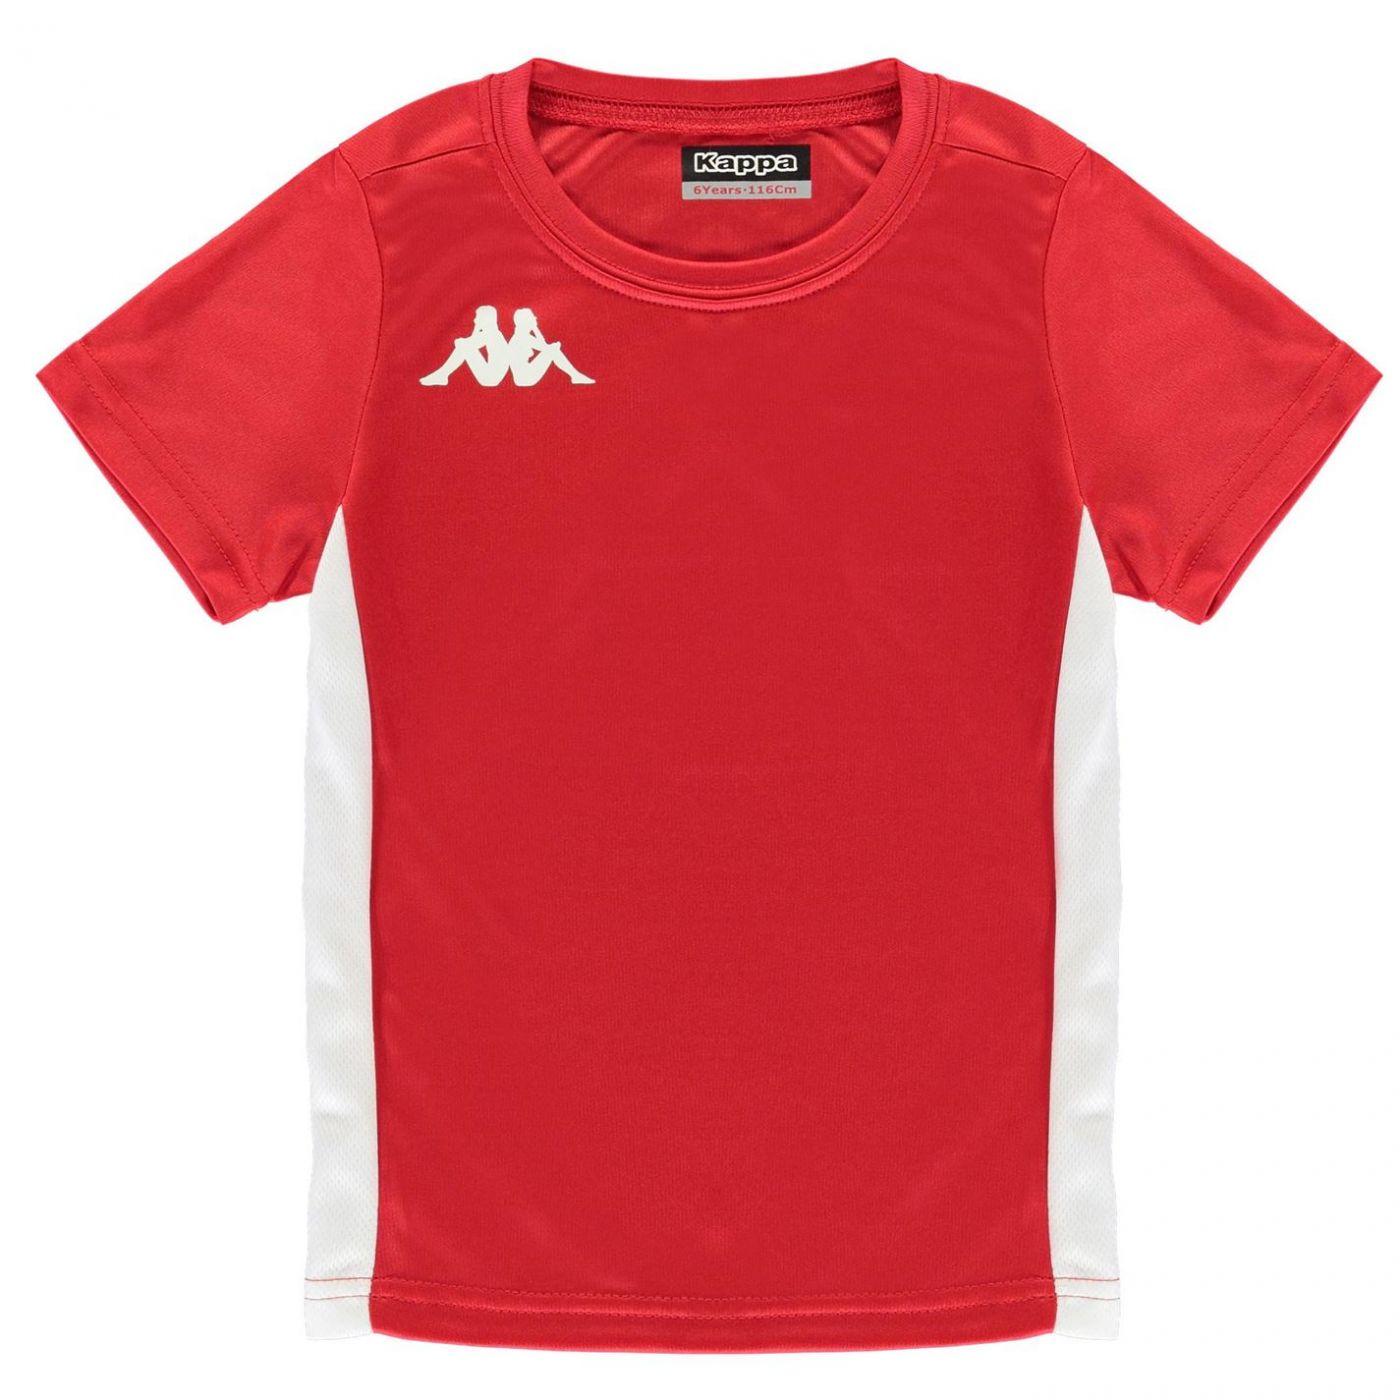 42983ad56c48 Kappa Torino Short Sleeve Top Junior Boys - FACTCOOL